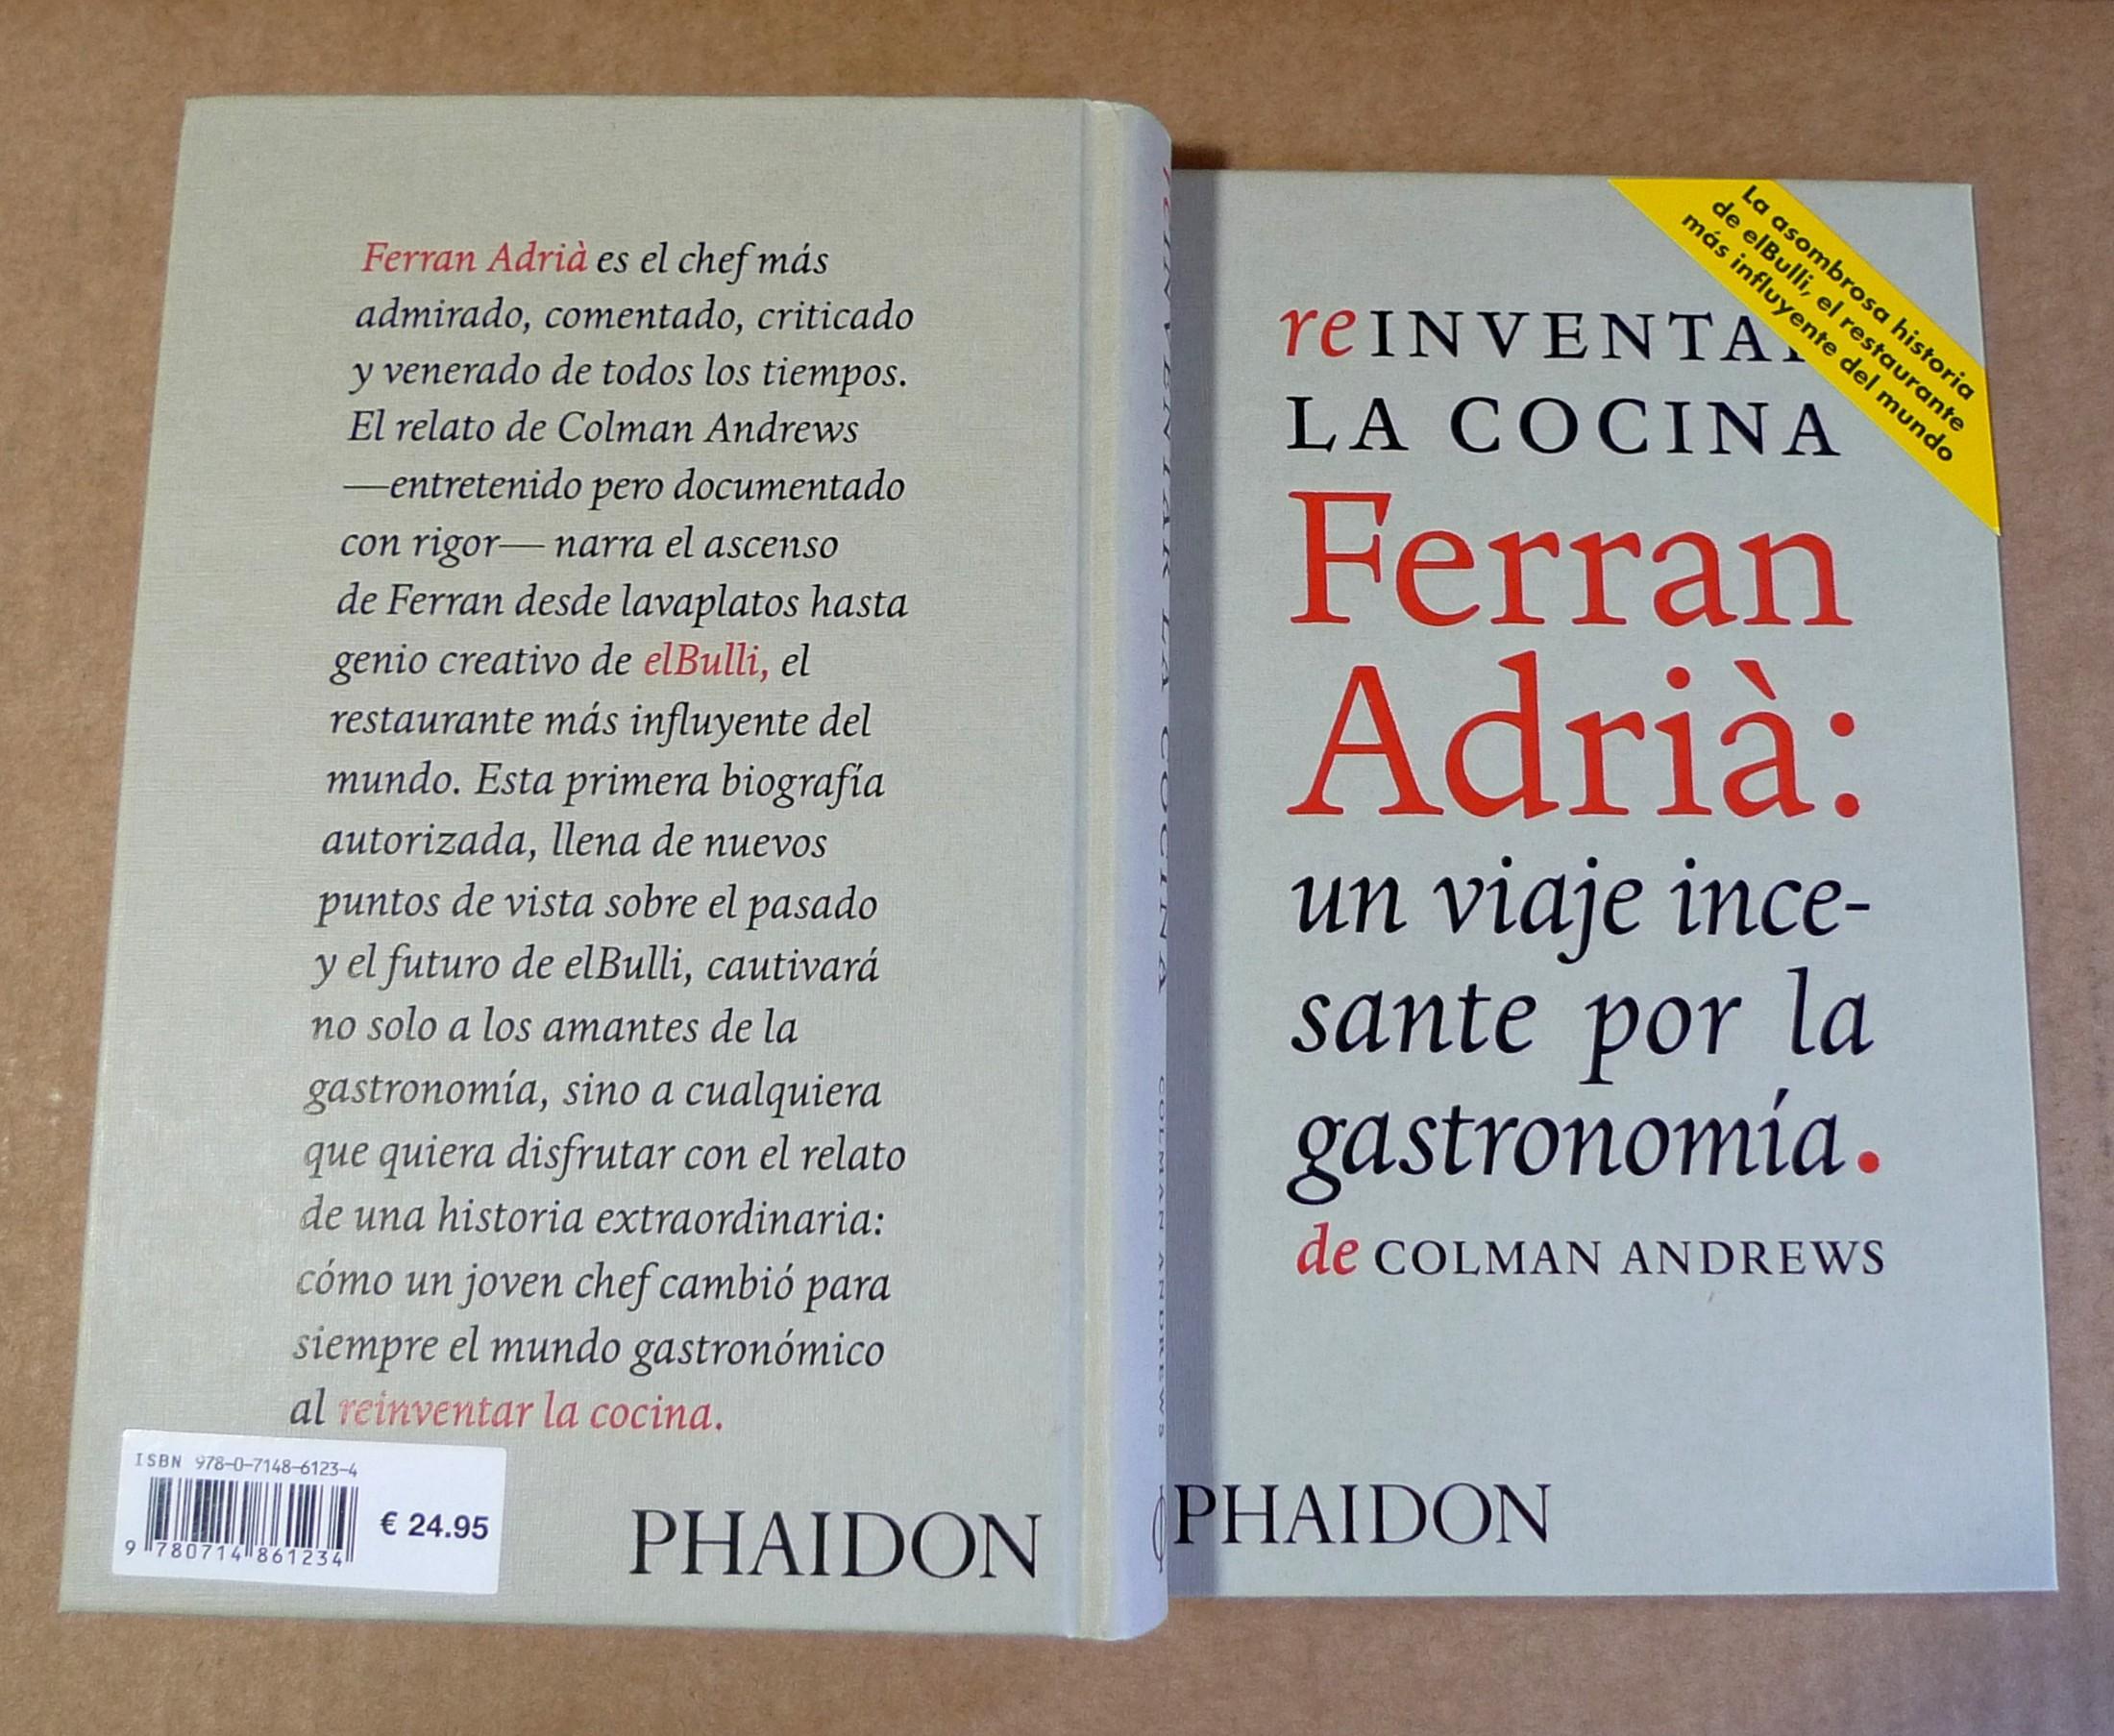 Ferran Adrià: Reinventar la cocina